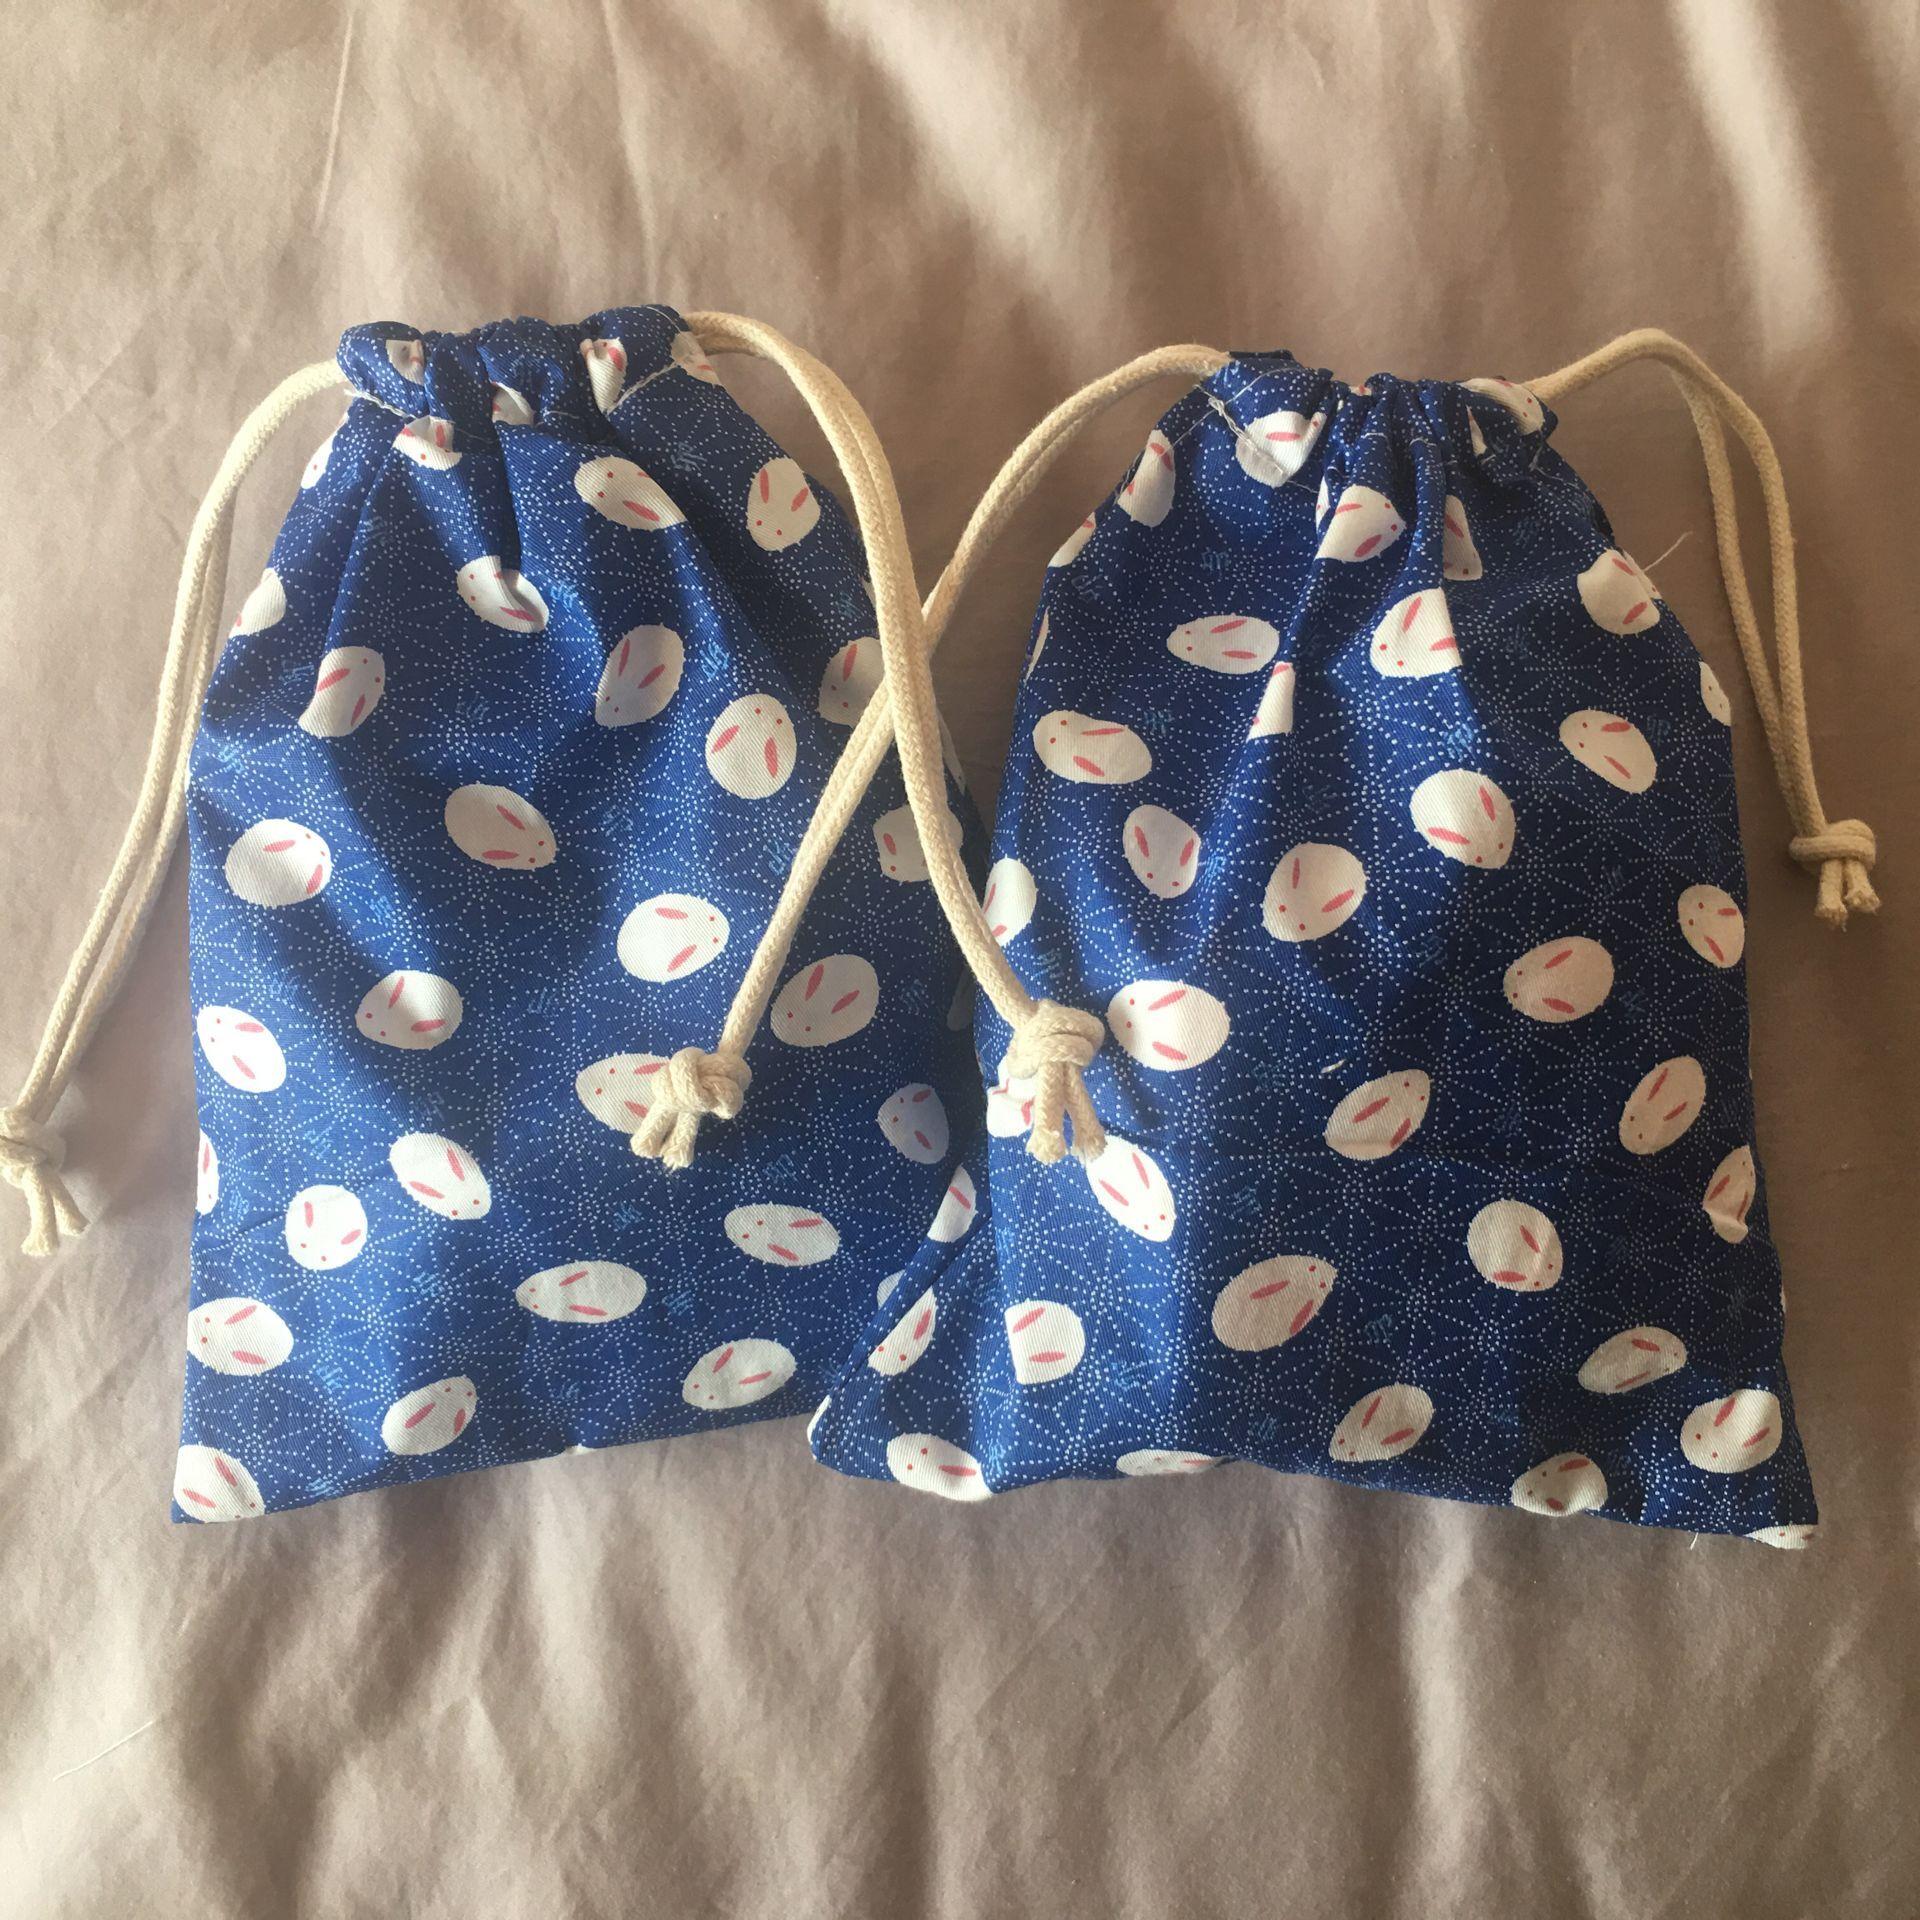 Cotton Drawstring Pouch Home Organized Party Gift Bag Chinese Zodiac Rabbit Head Blue 20312b